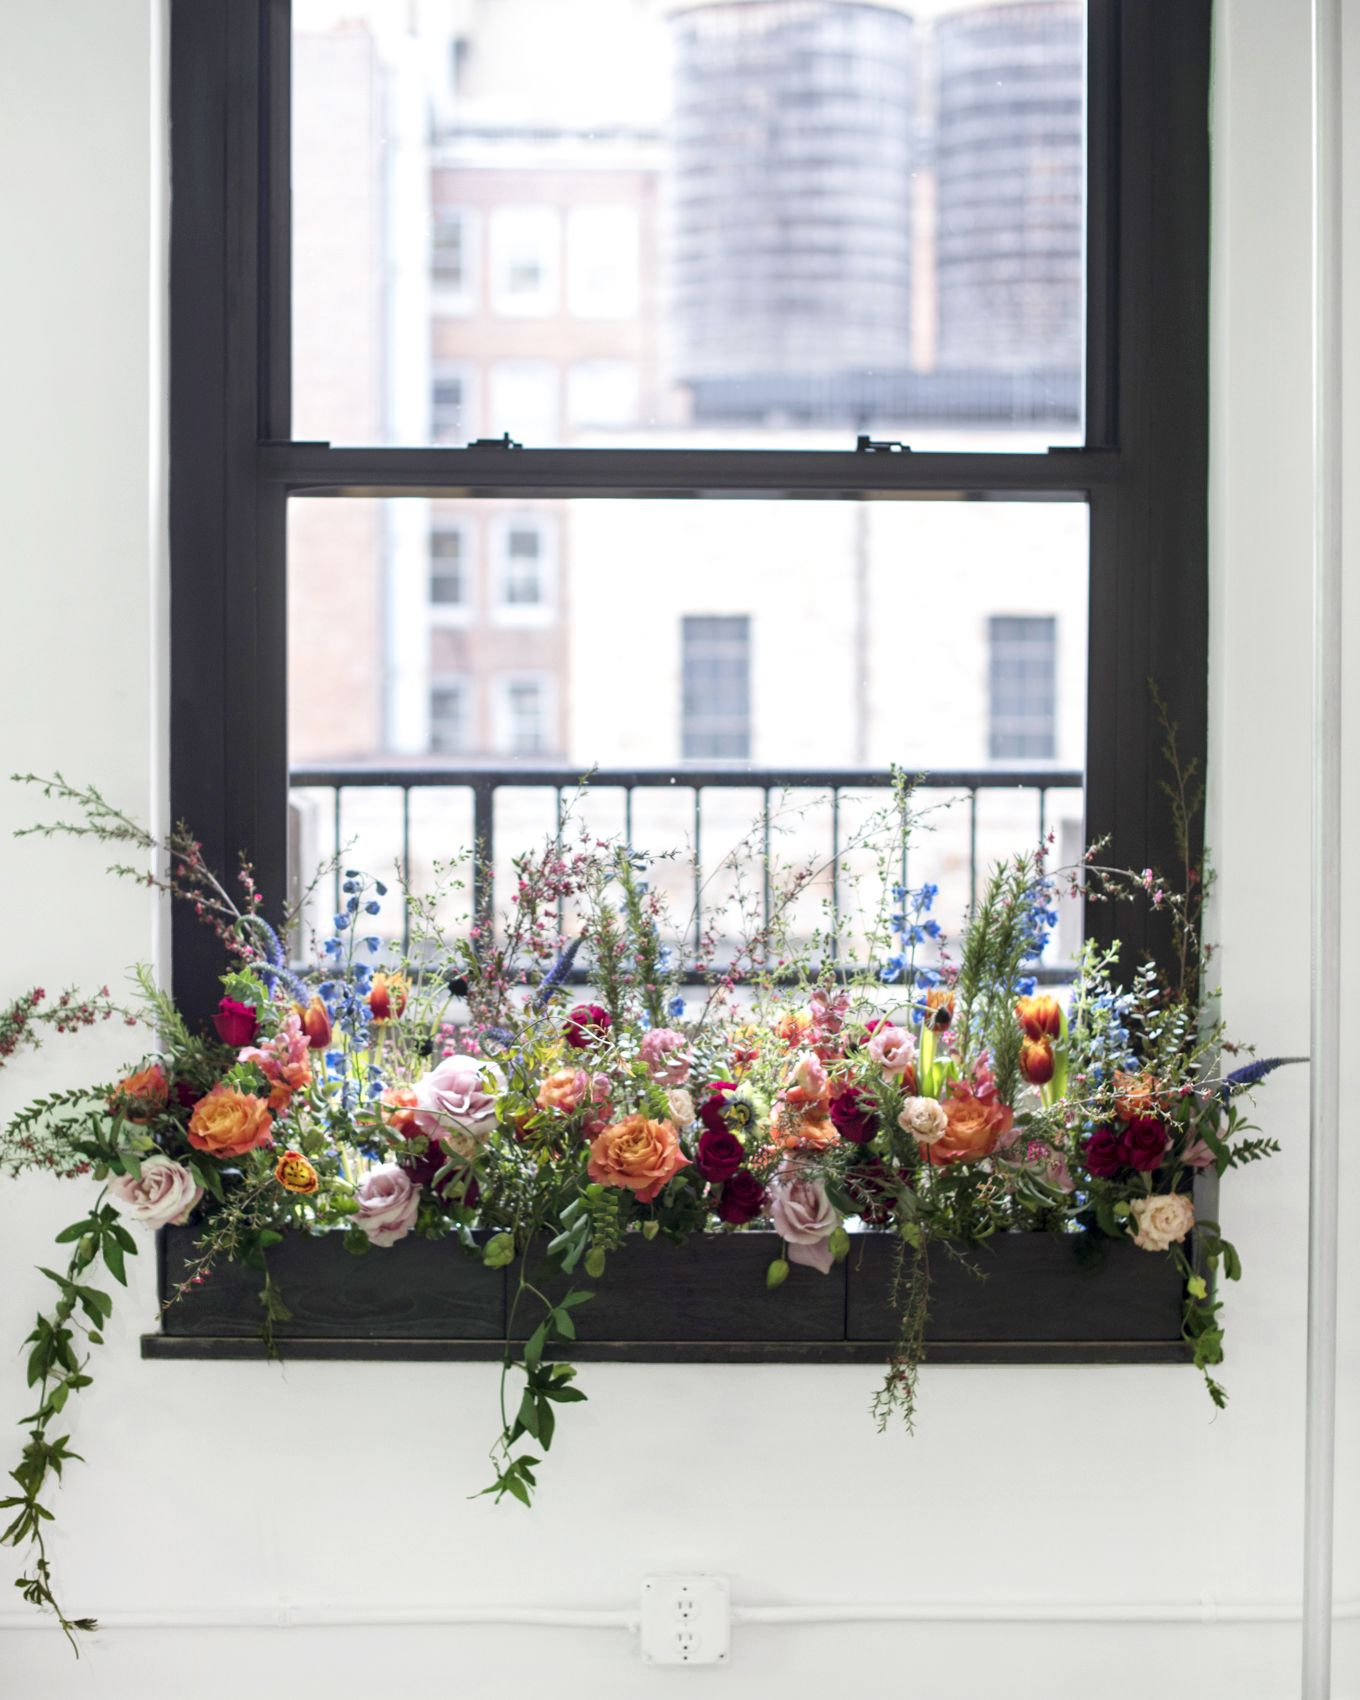 Interior Florals Our Contemporary Design Fixation